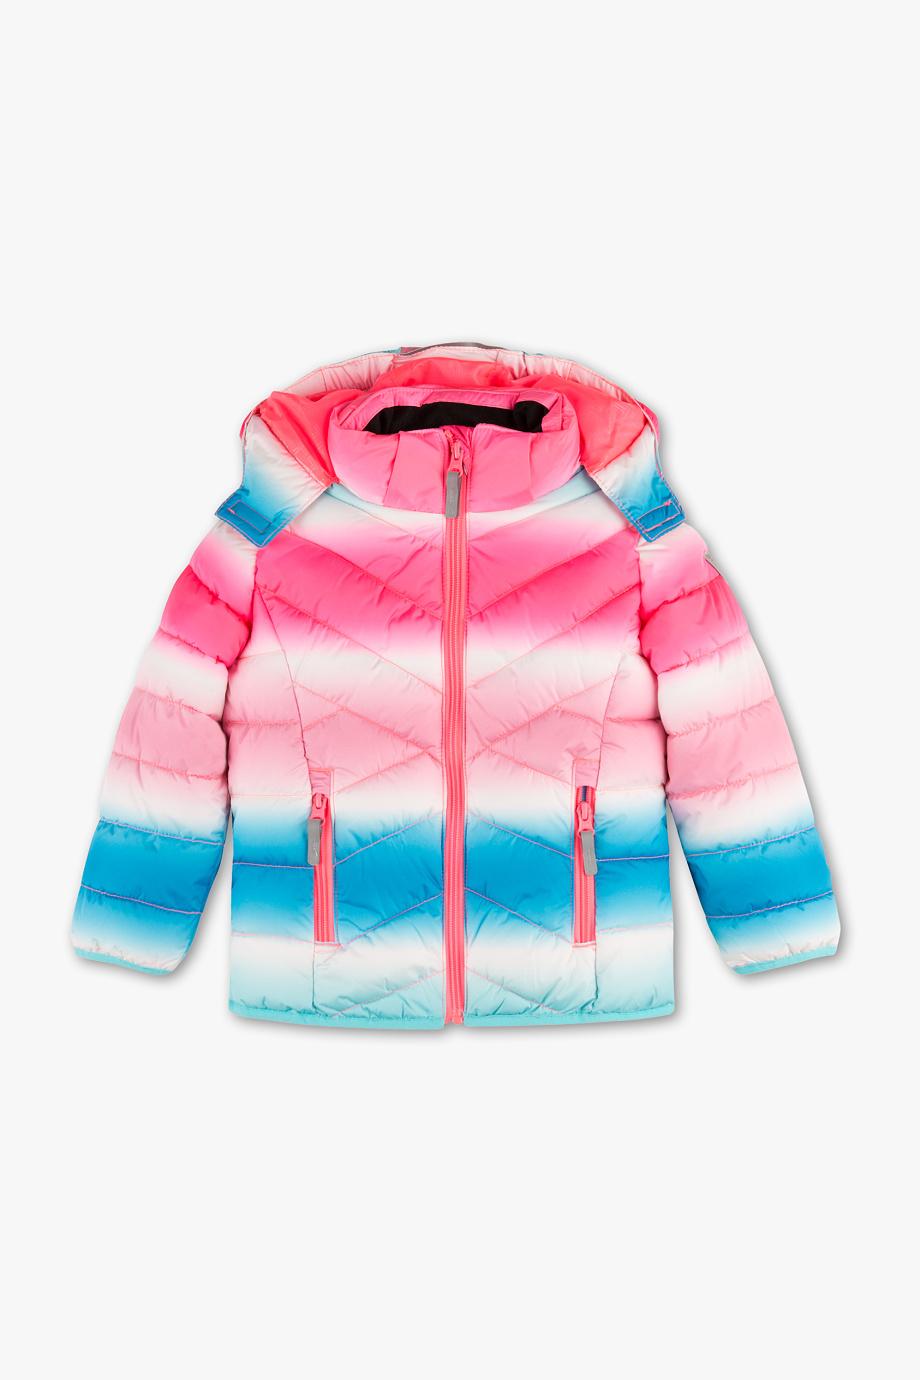 bunte Skijacke in rosa blau weiß